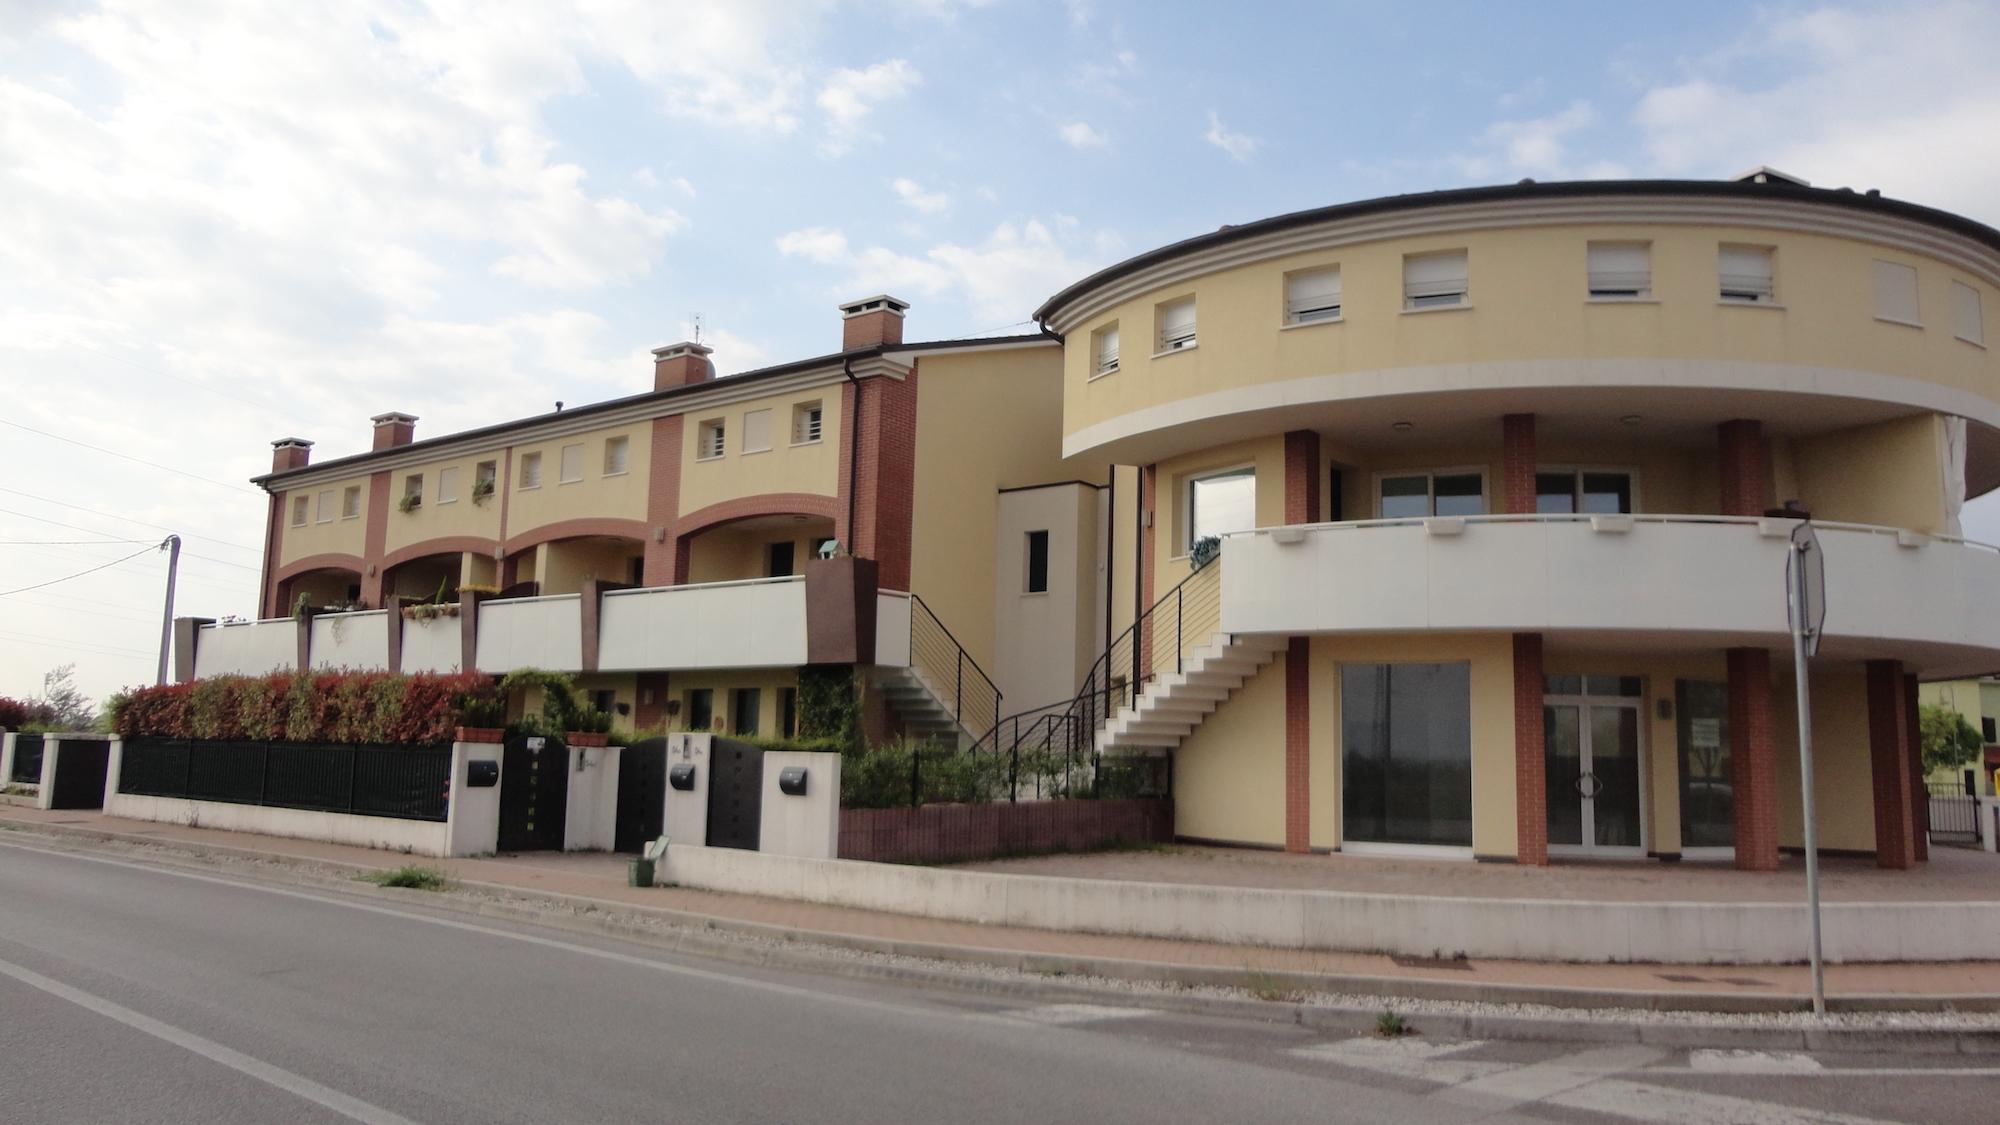 Residence l'Angolo di Costabissara (Vicenza)